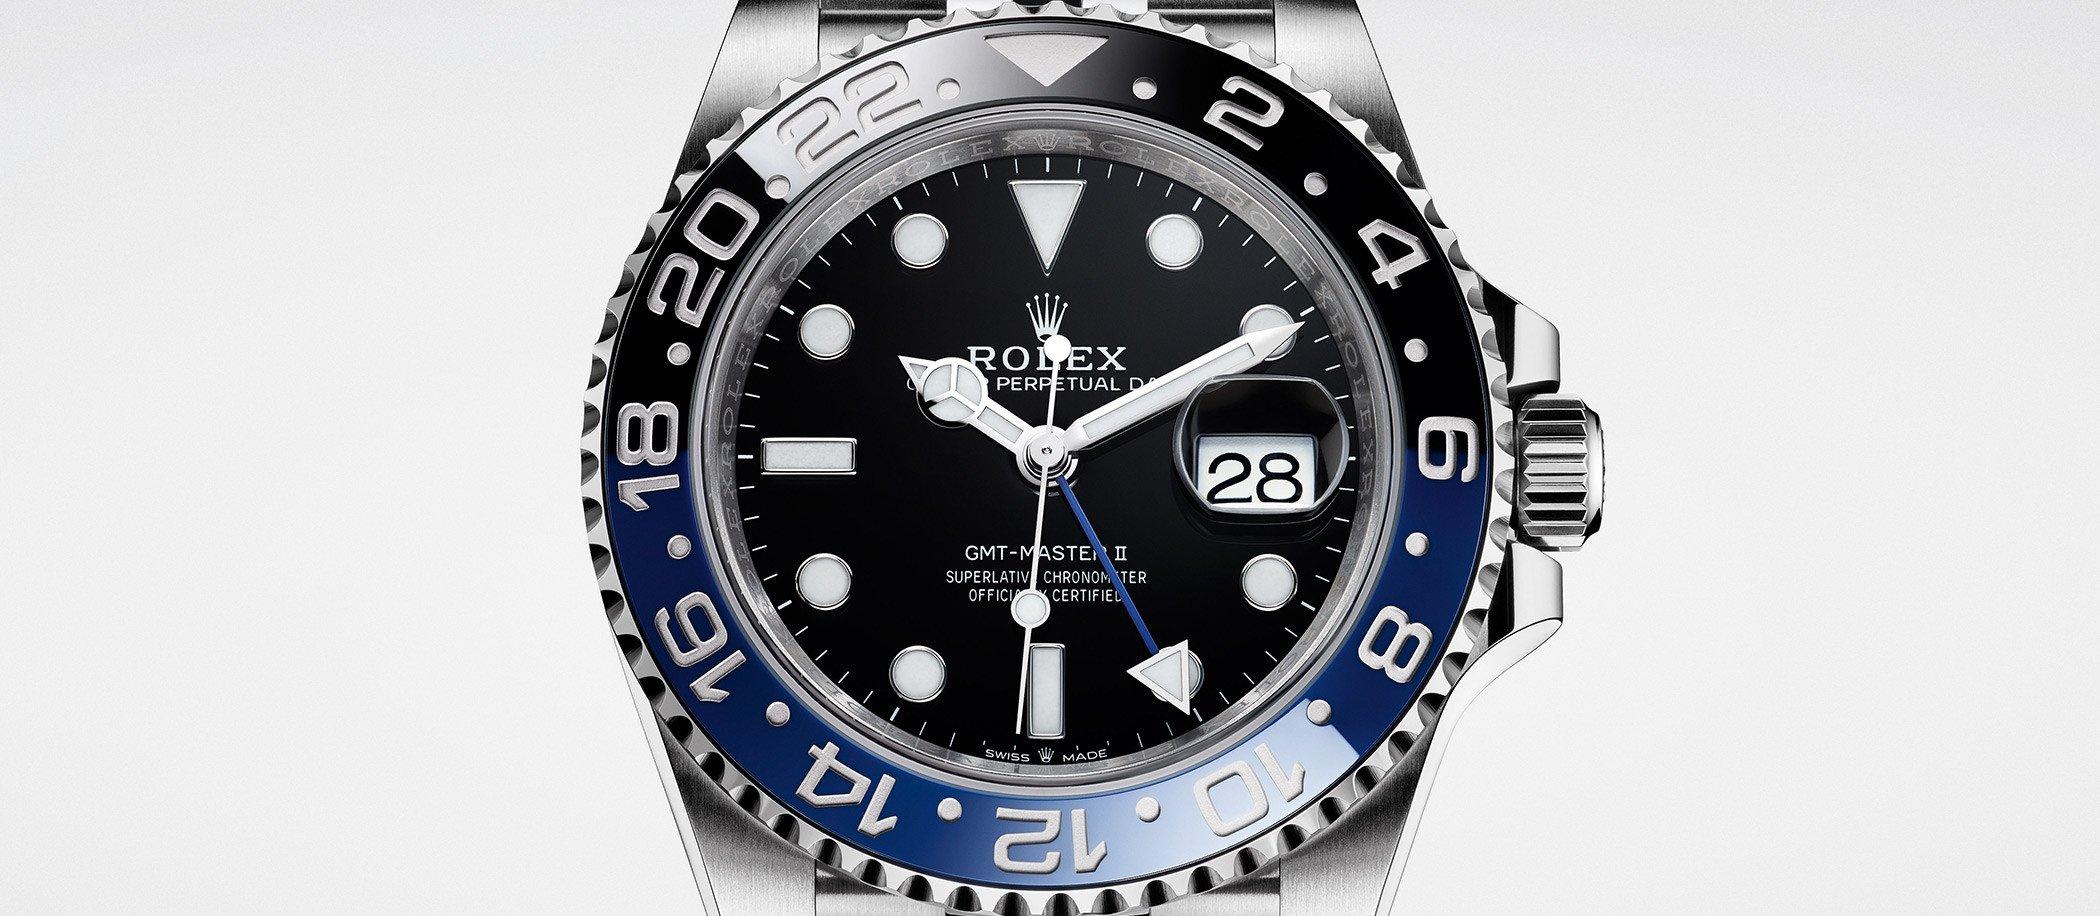 Rolex GMT-Master II Ref. 126710 BLNR